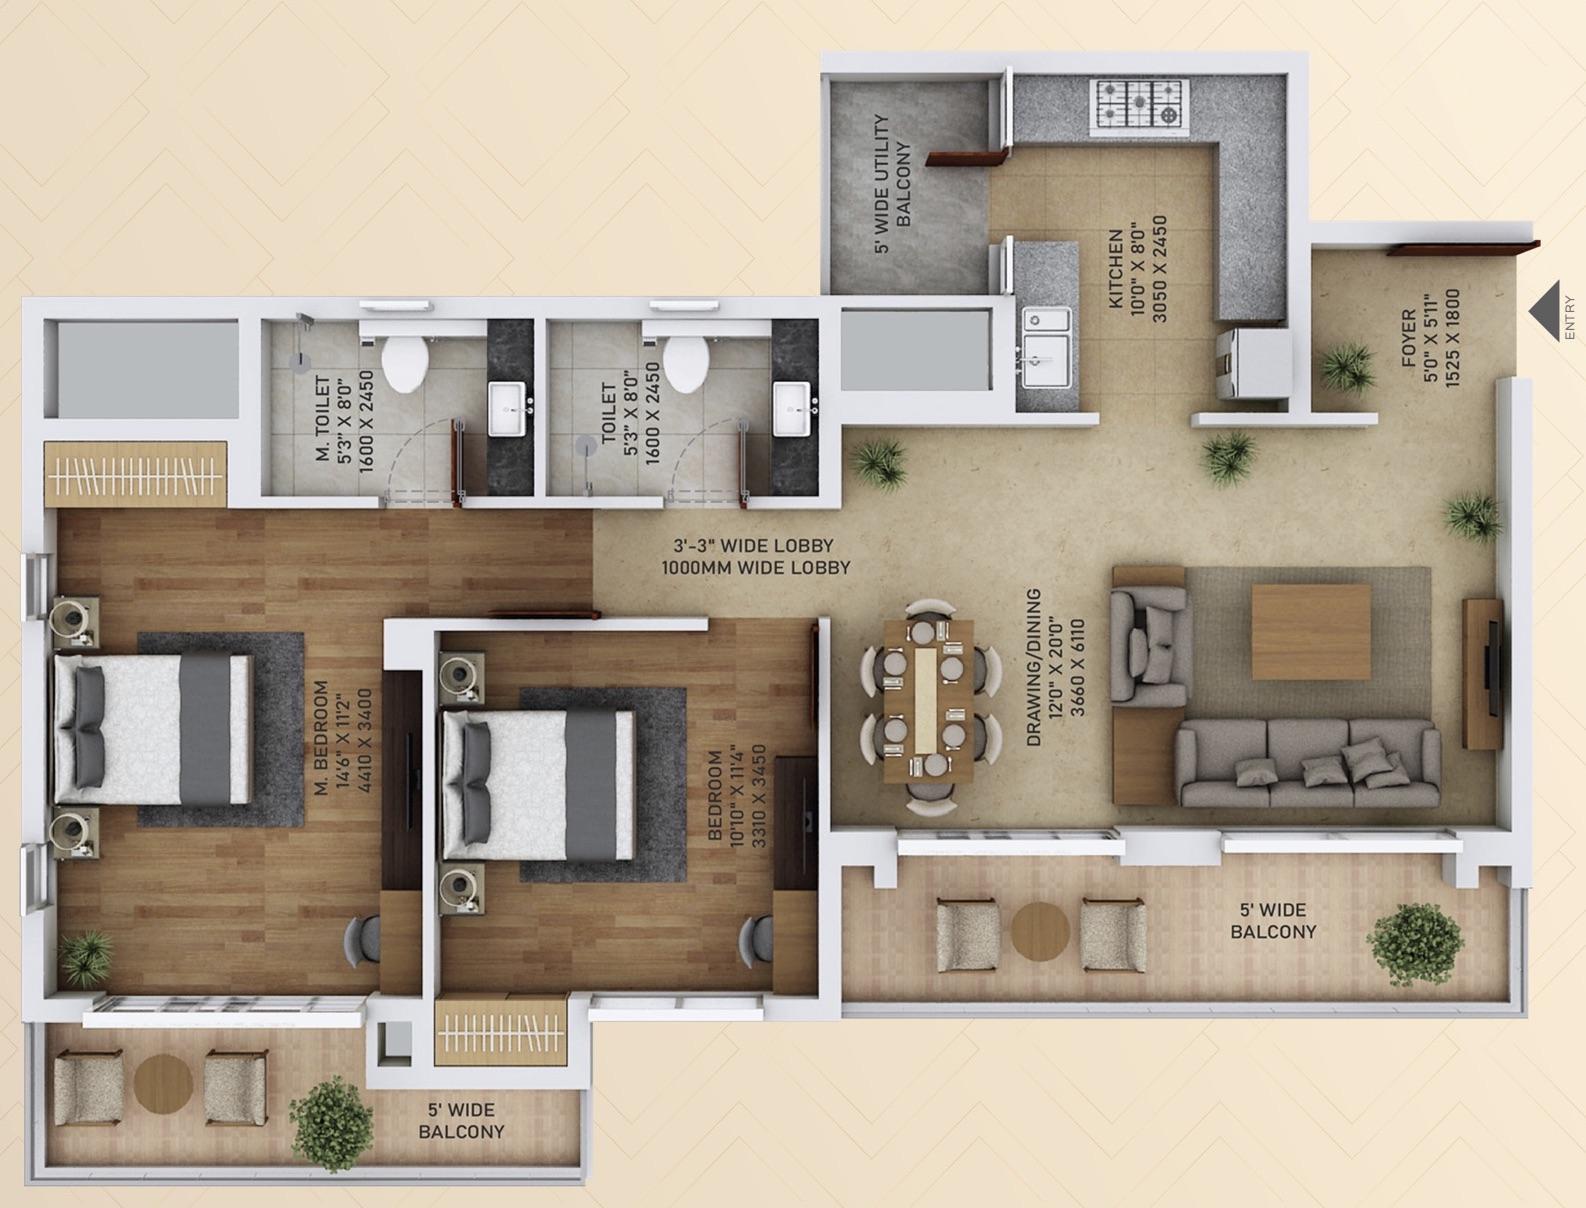 2 BHK apartments Noida